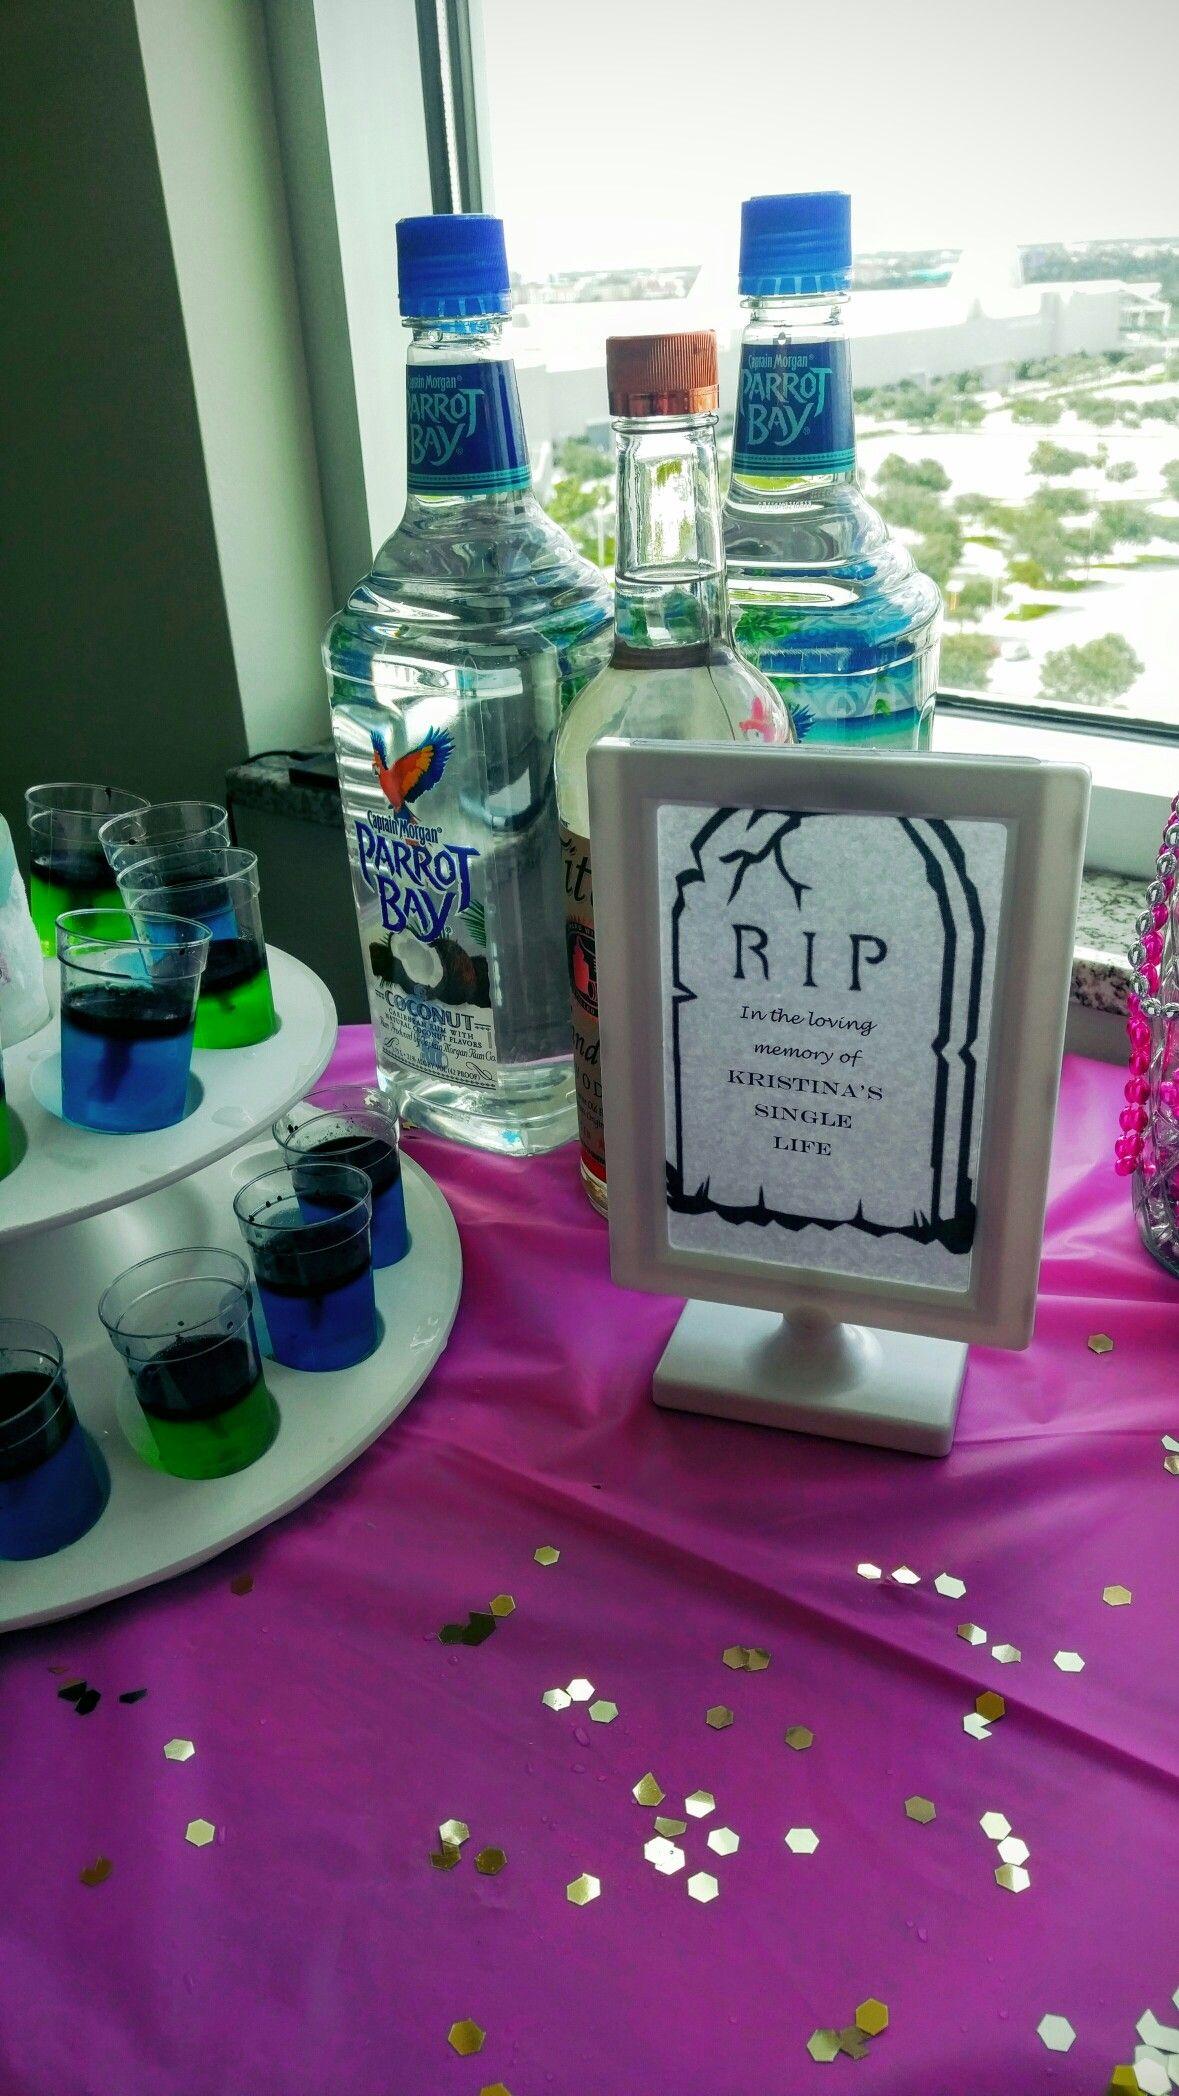 Riptomysinglelife Bacheloretteparty Girlsnightout In 2020 Bachelorette Diy Hotel Party Bachelorette Party